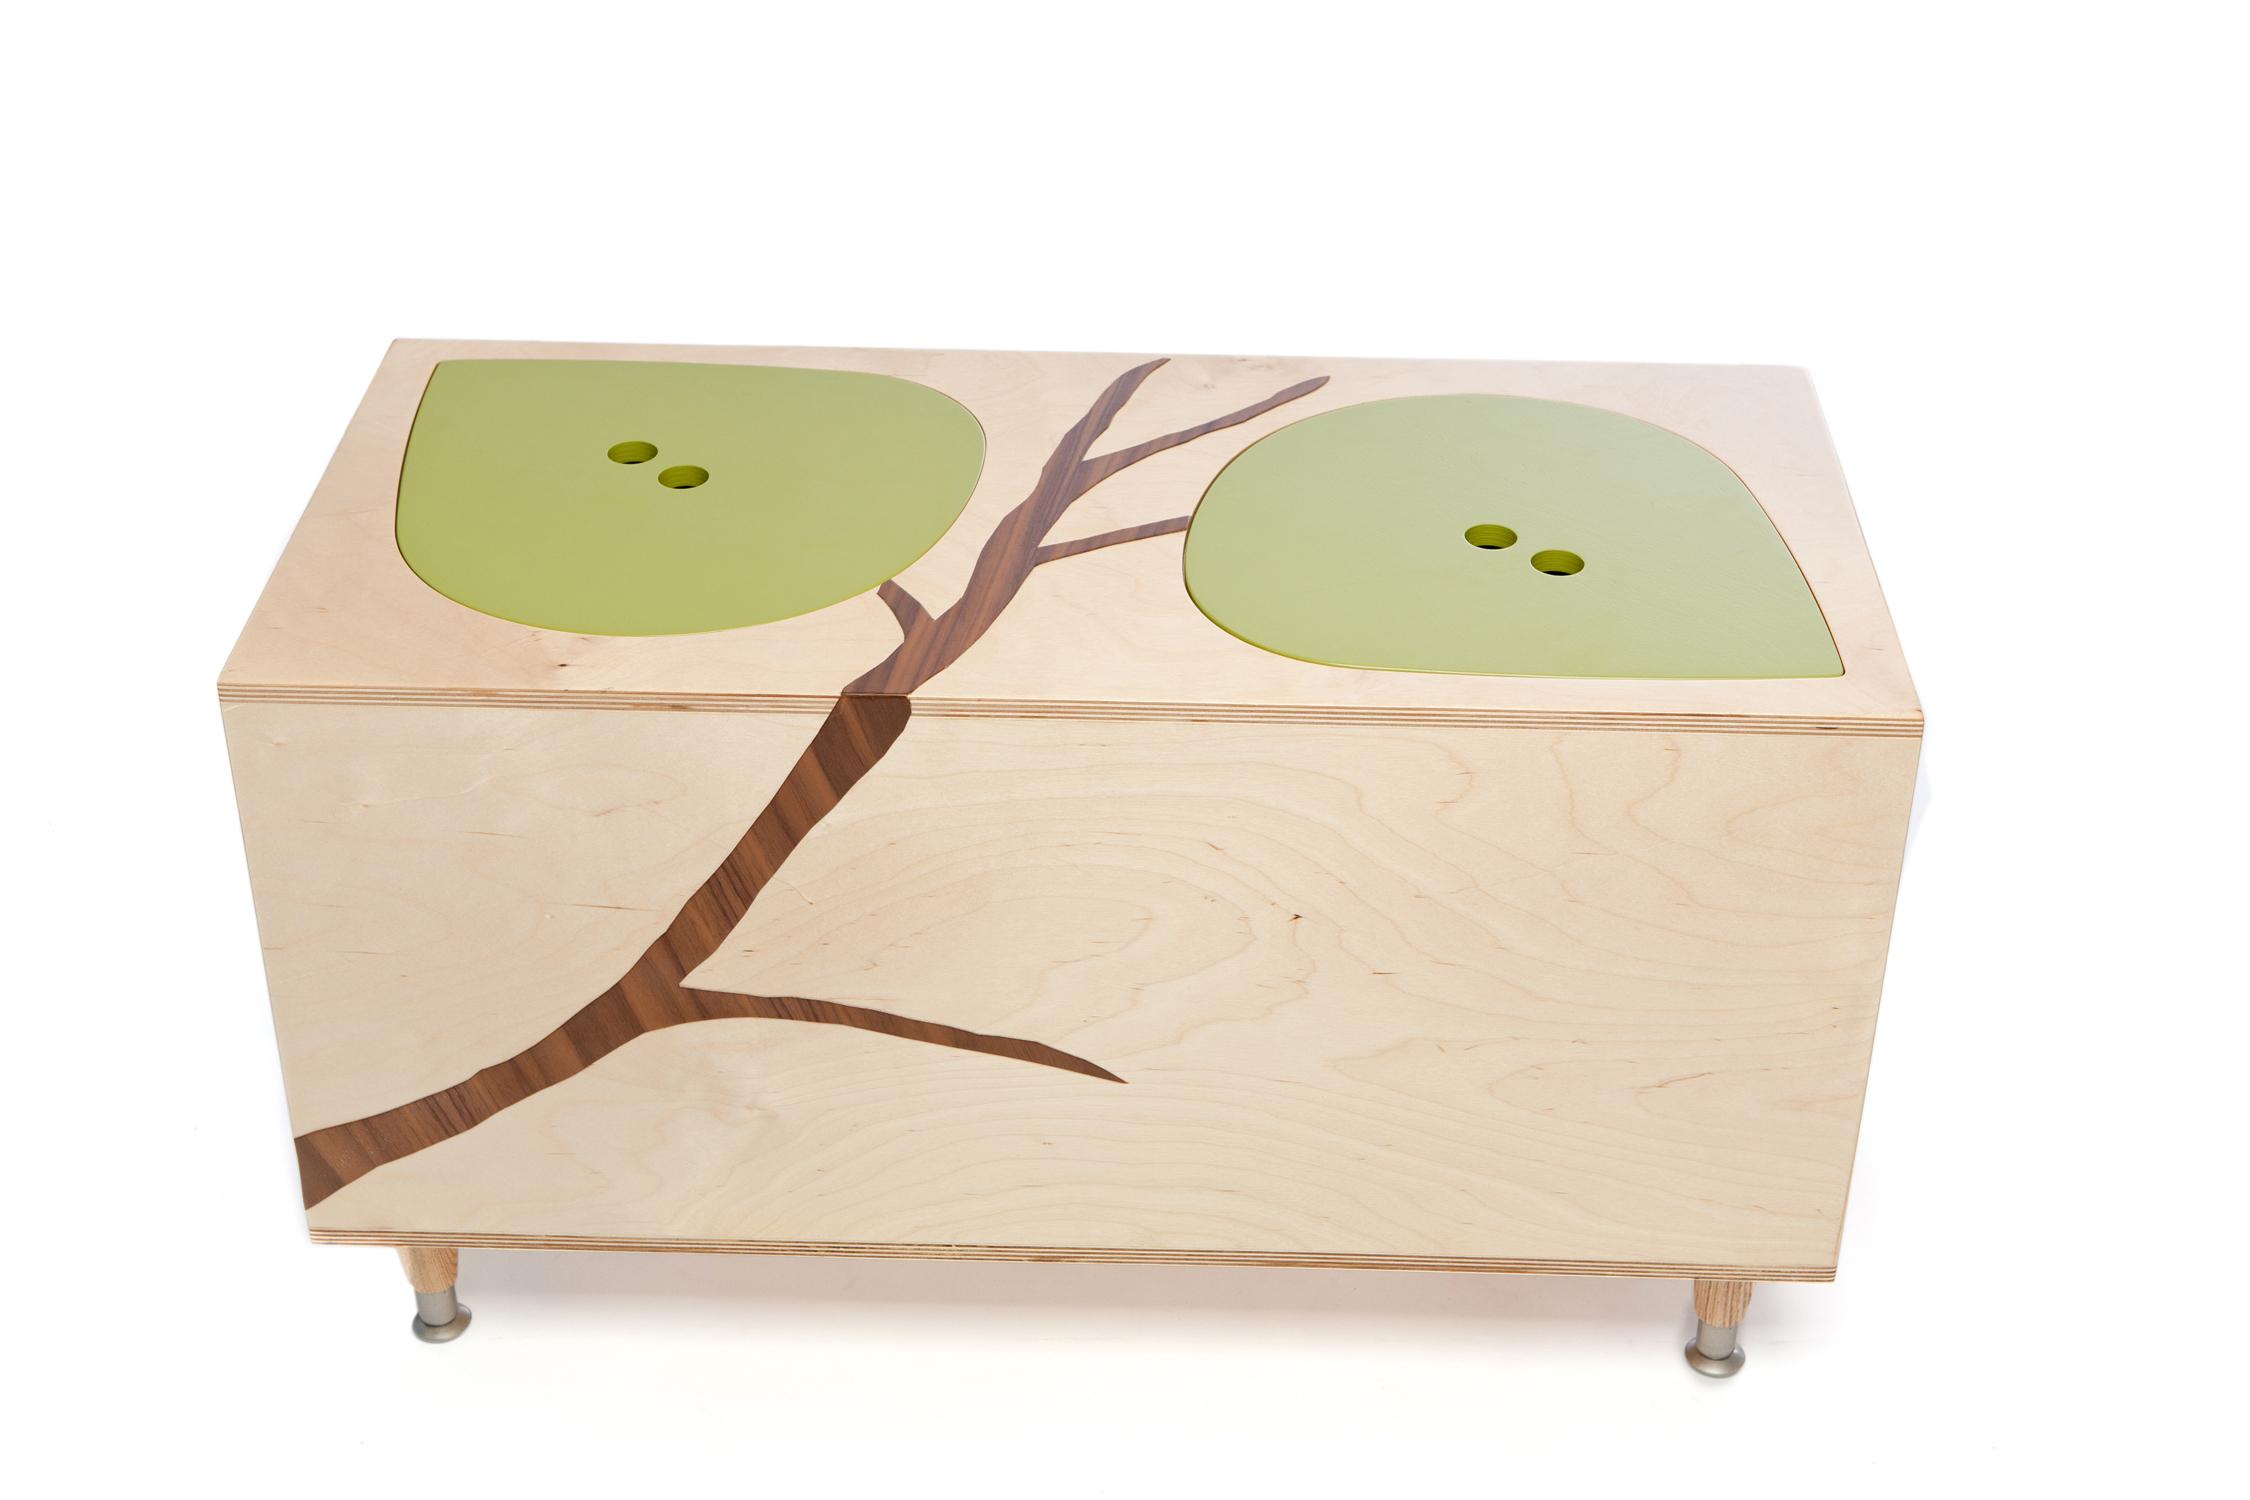 mod mom shark tank investor invests k in etsy seller mod mom  - mod mom furniture